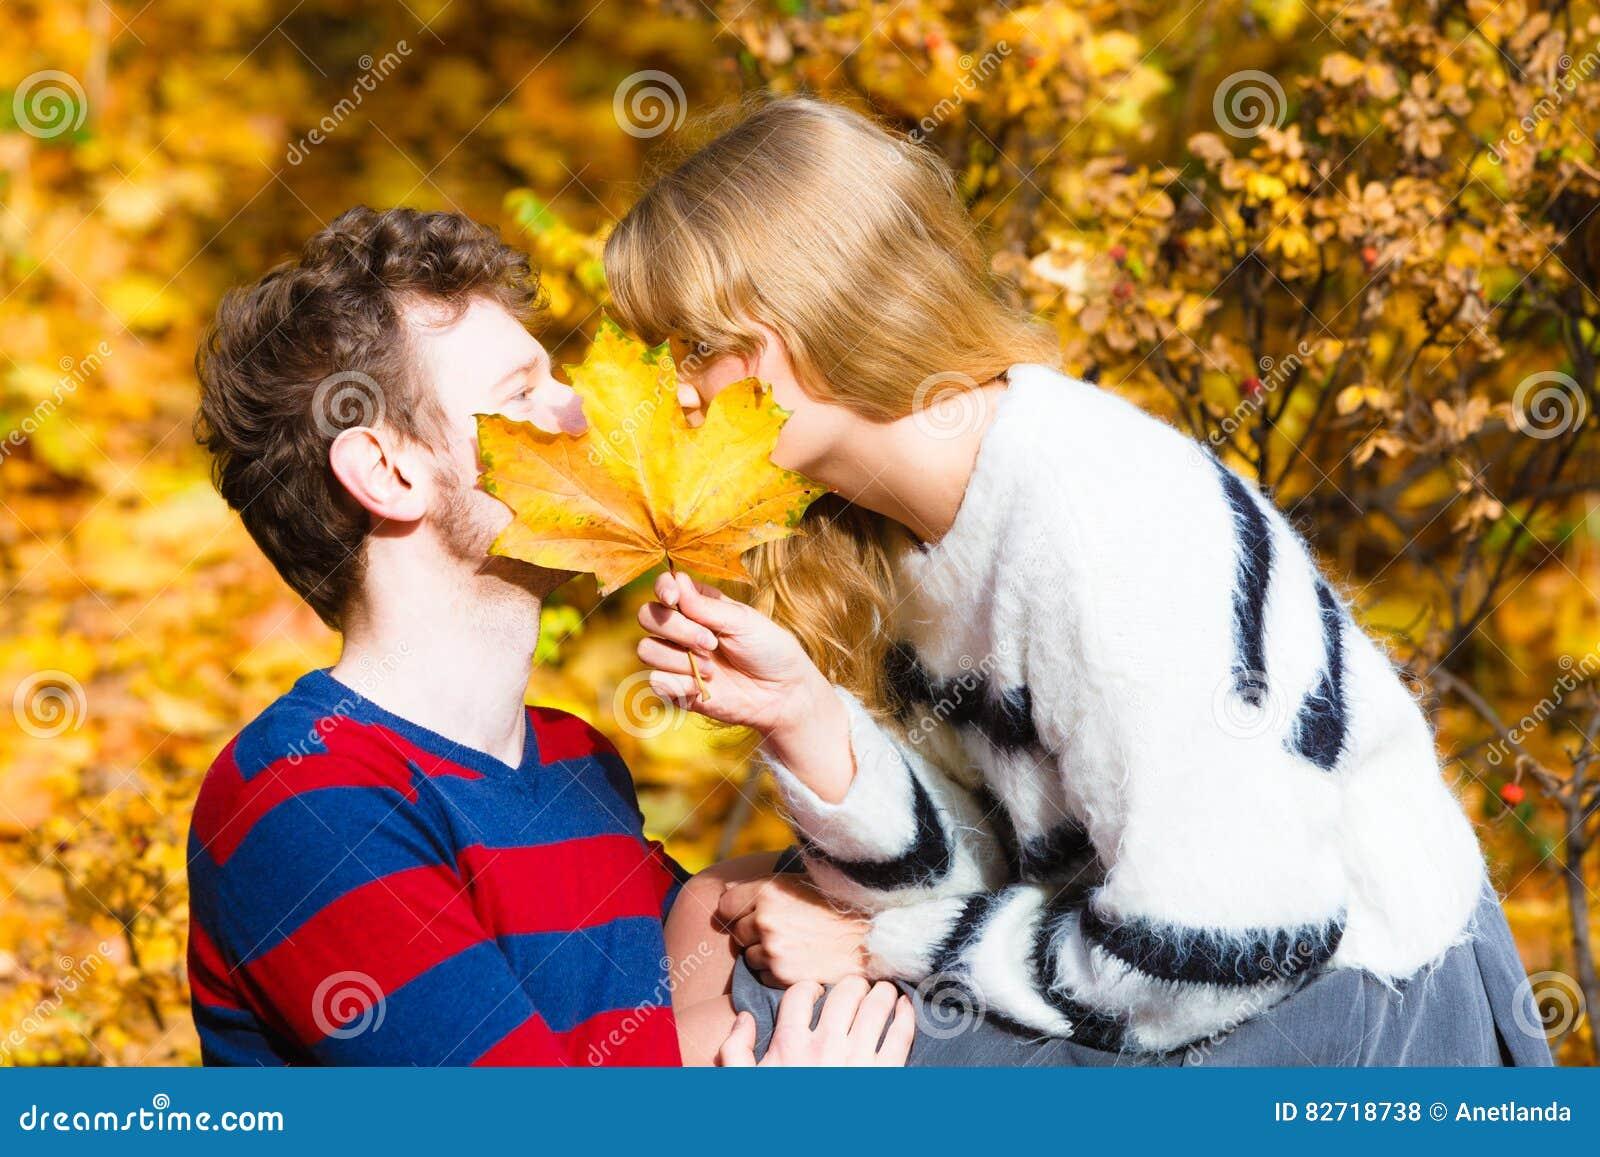 dating maple